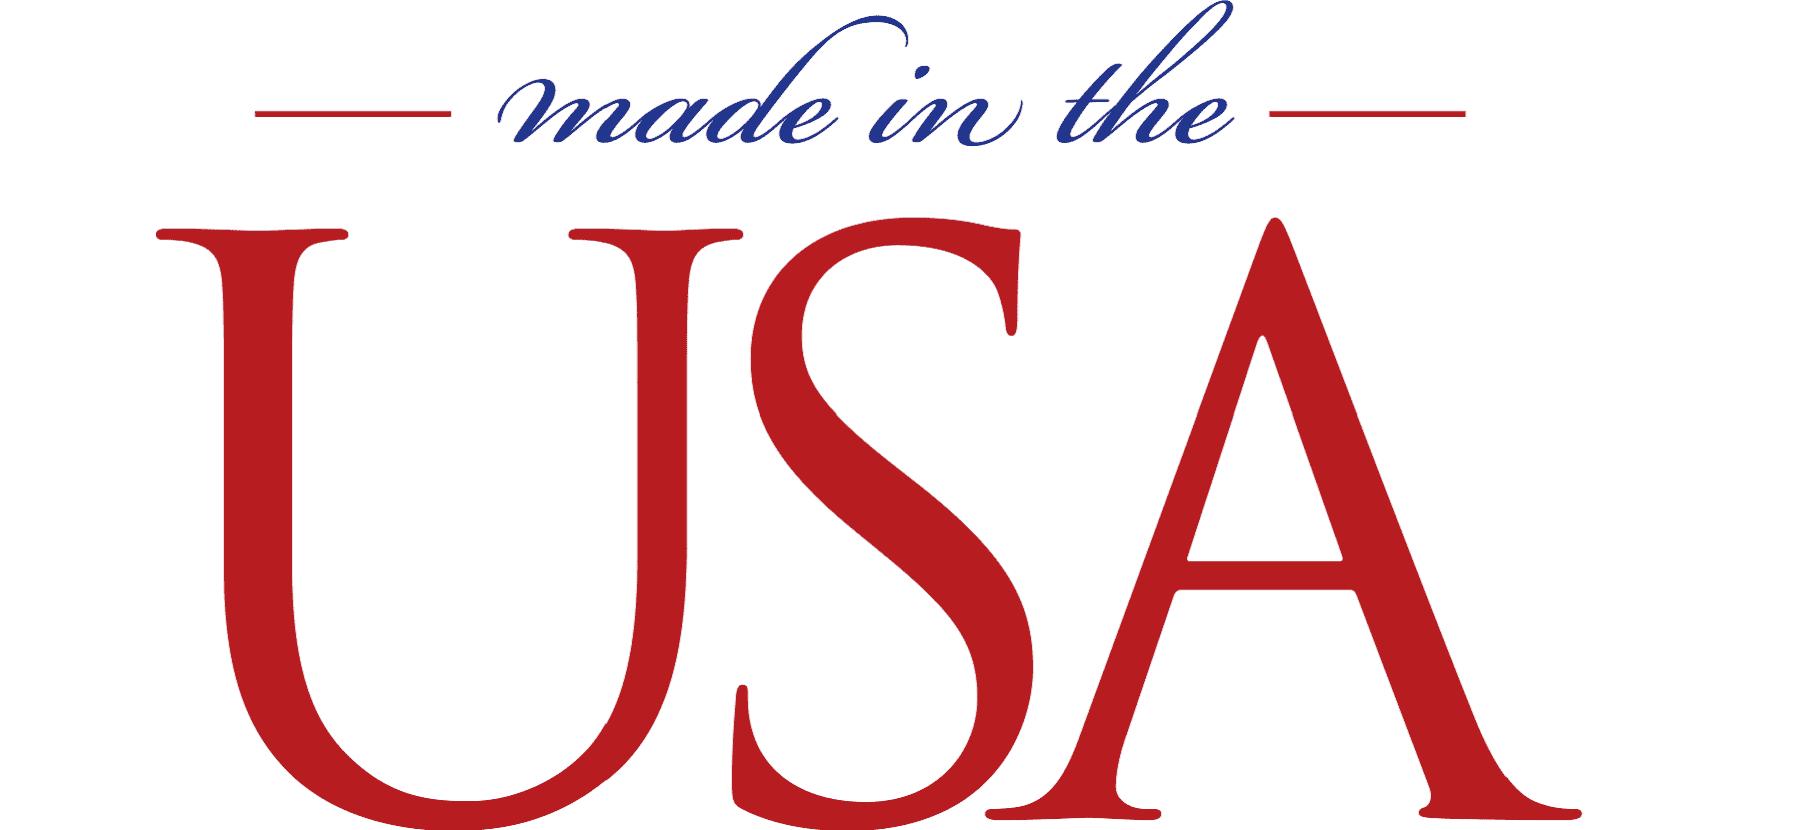 Made in USA logo_2